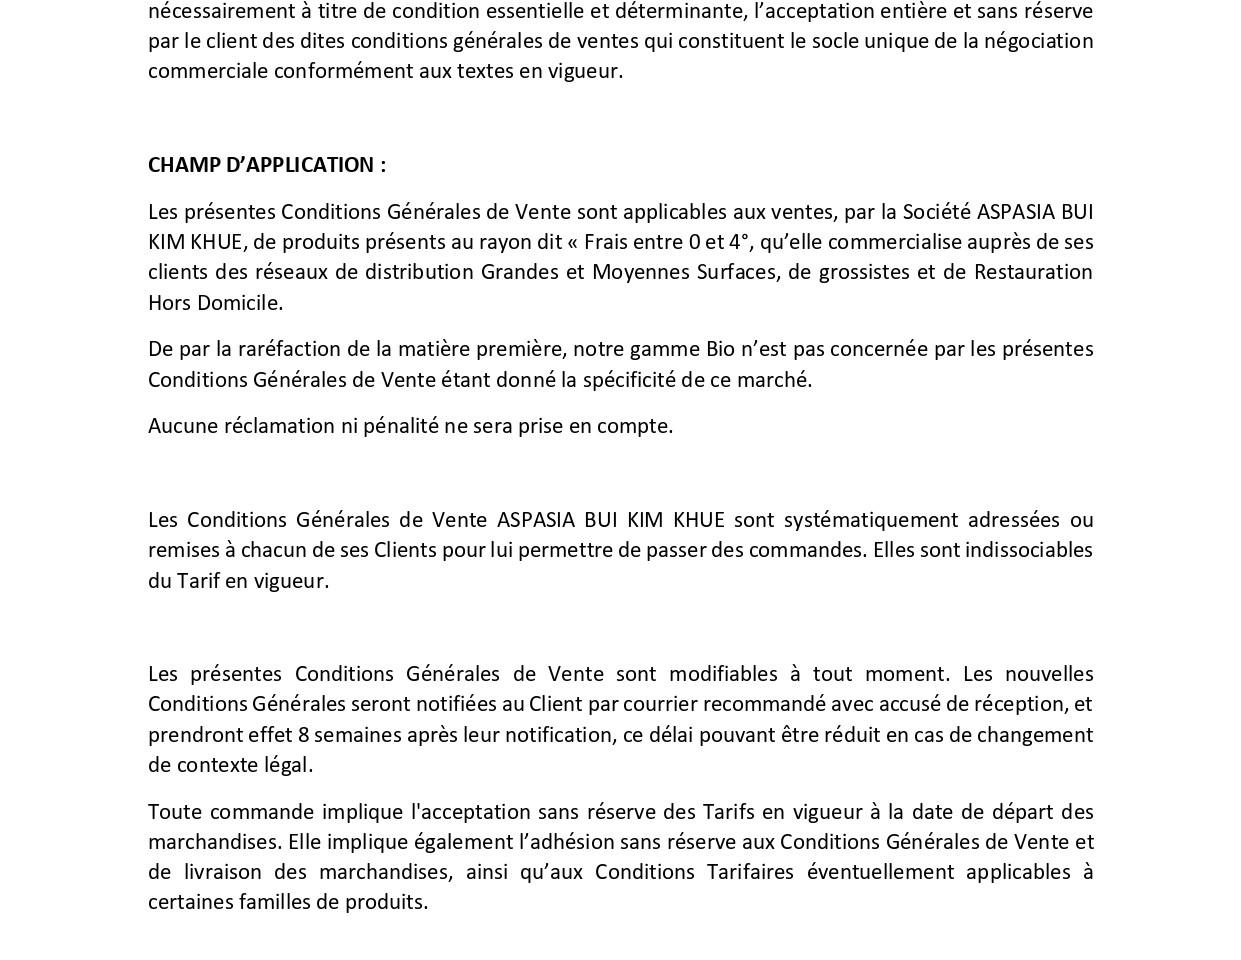 CGV ASPASIA 2020_page-0002.jpg